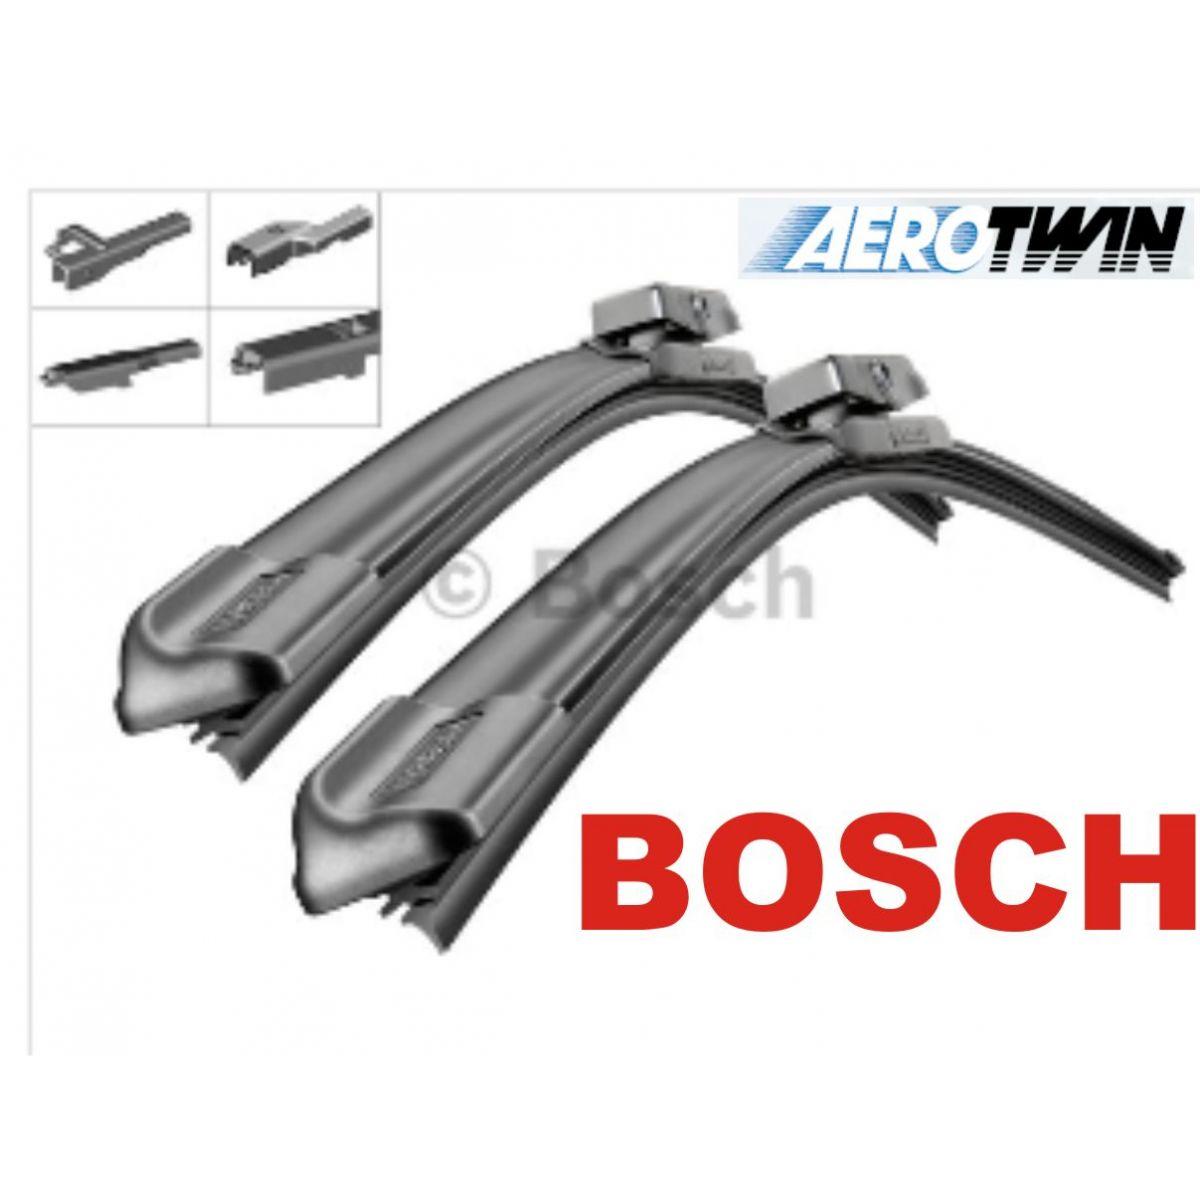 Palheta Bosch Aerotwin Plus Limpador de para brisa Bosch BMW X5 X6